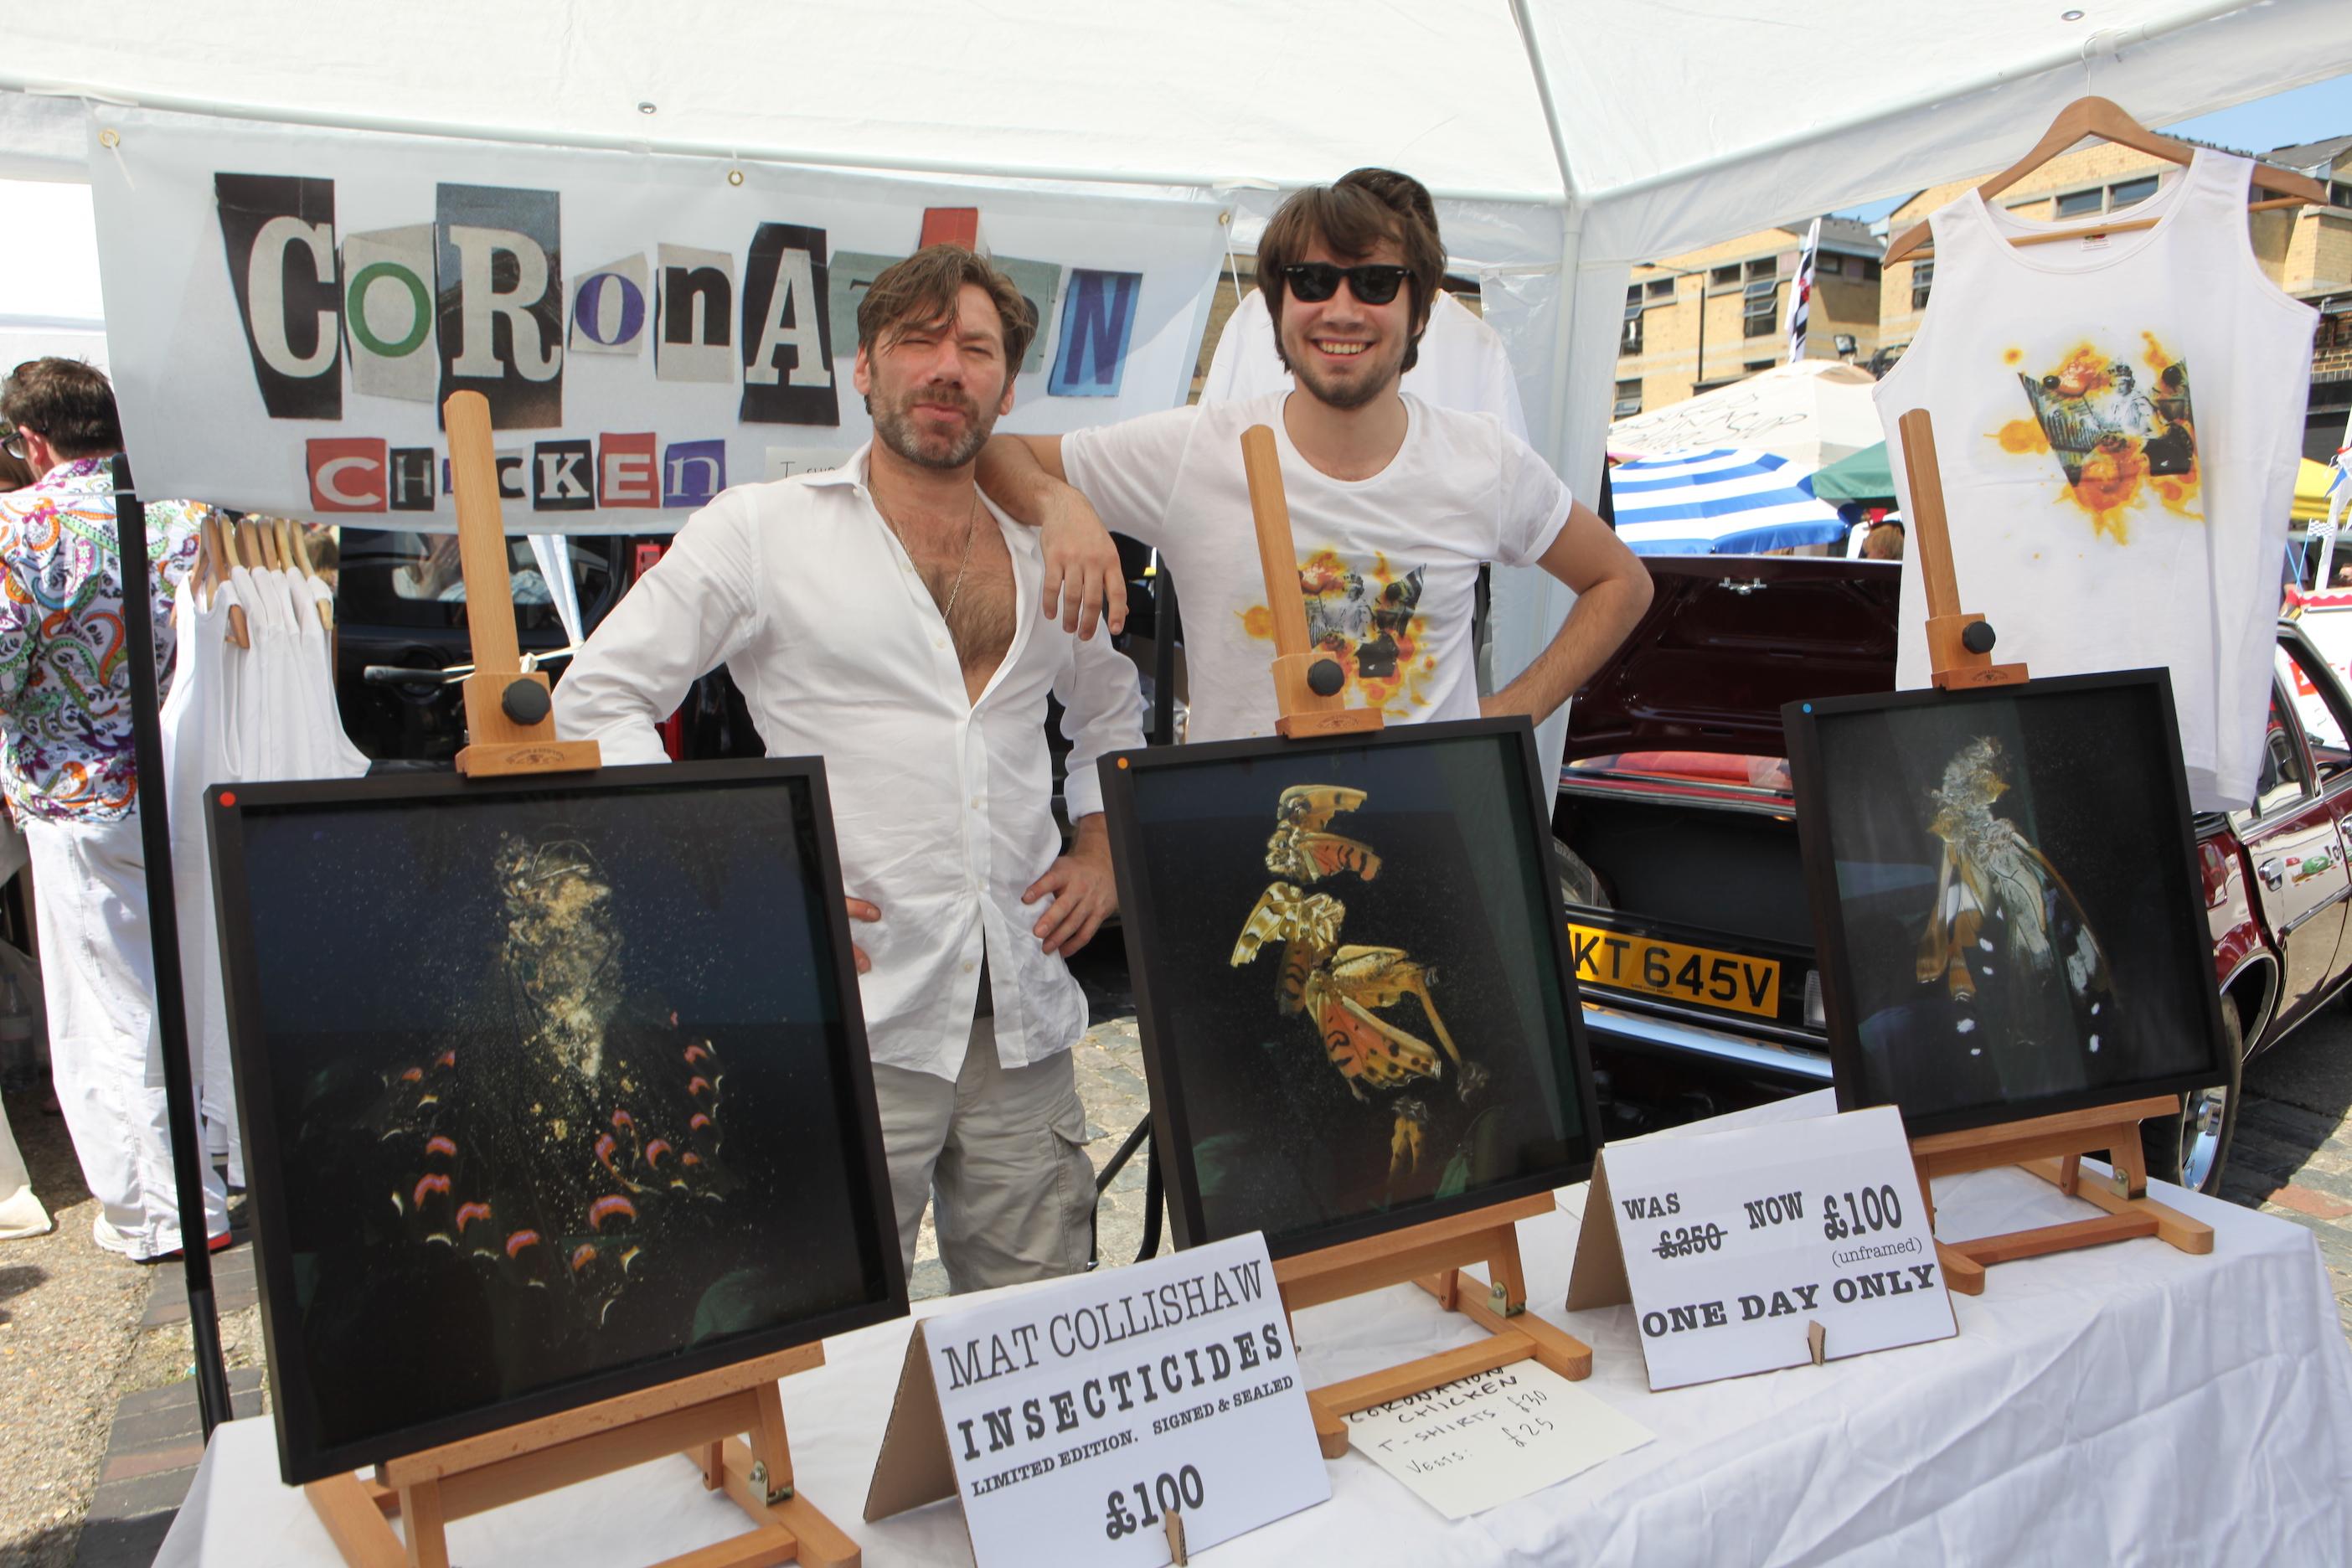 Don T Miss The Art Car Boot Fair In King S Cross